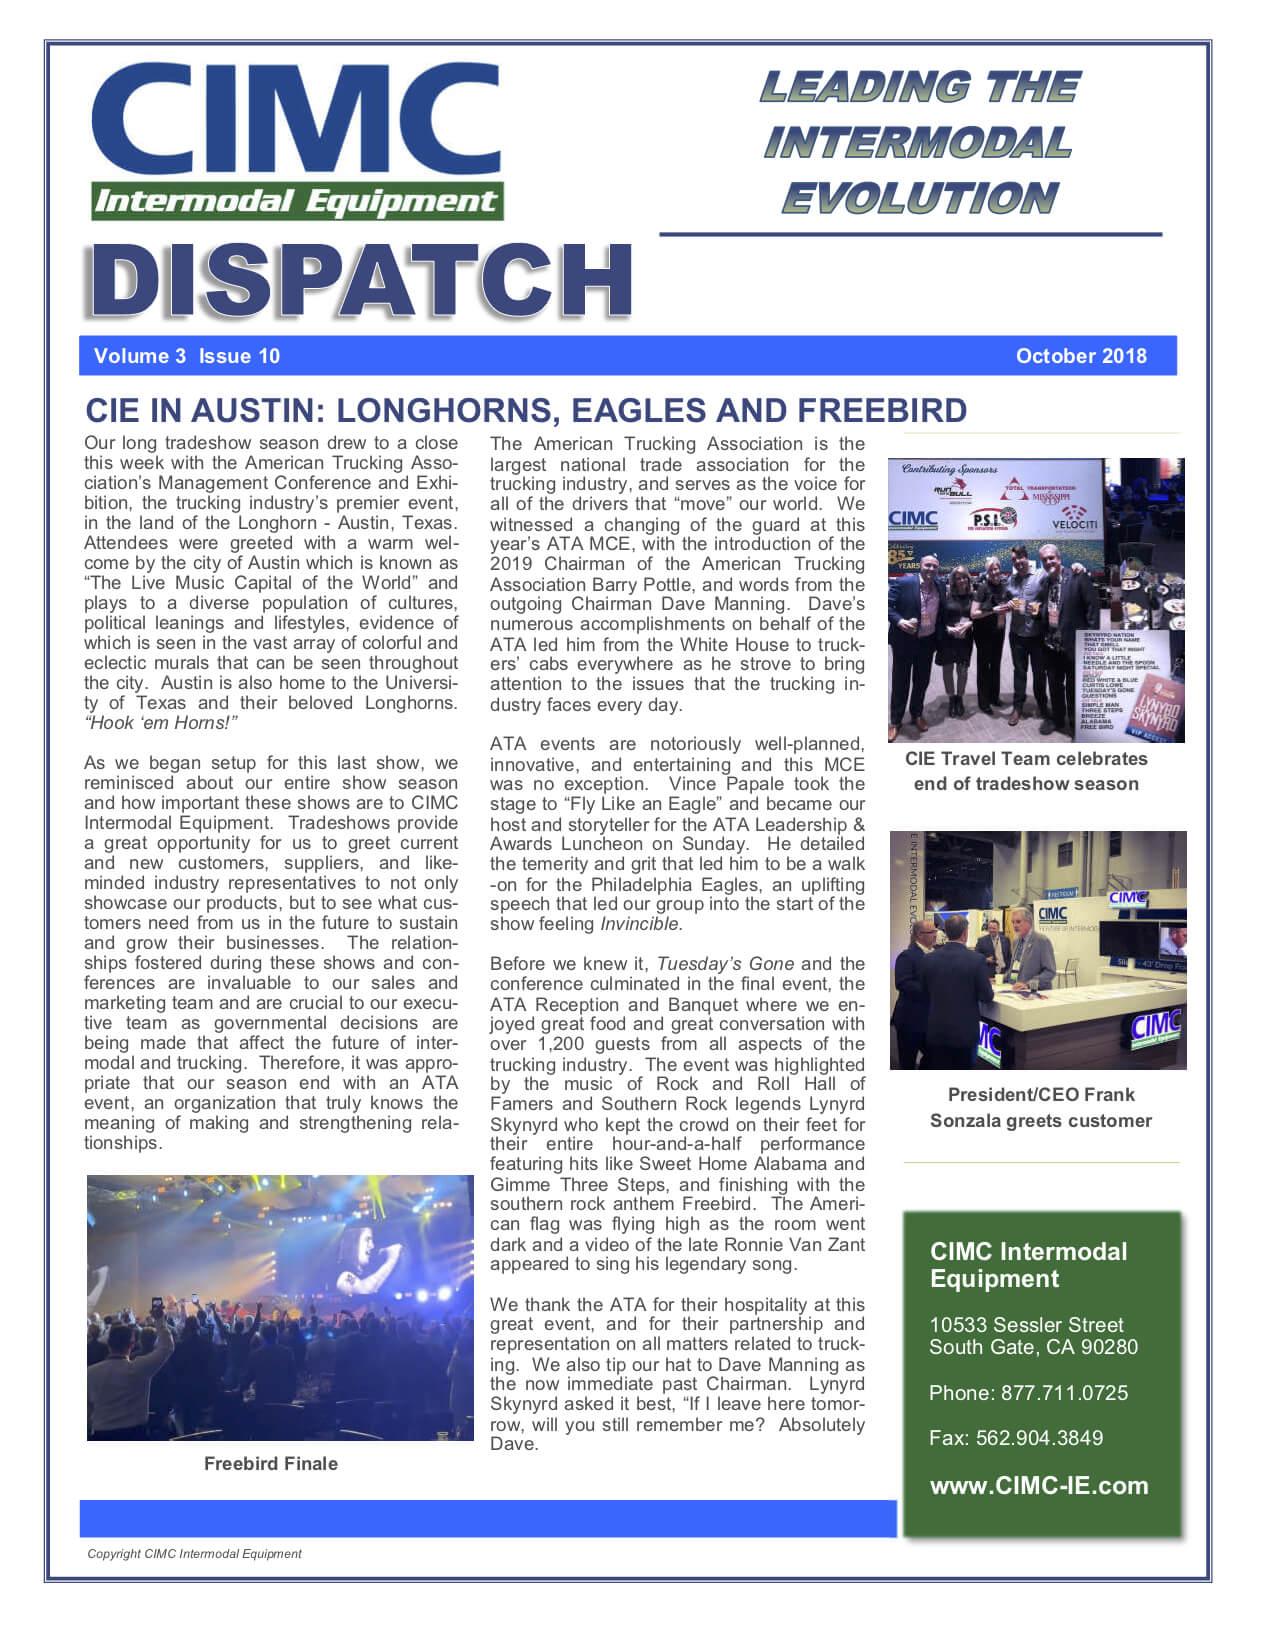 CIMC Dispatch October 2018